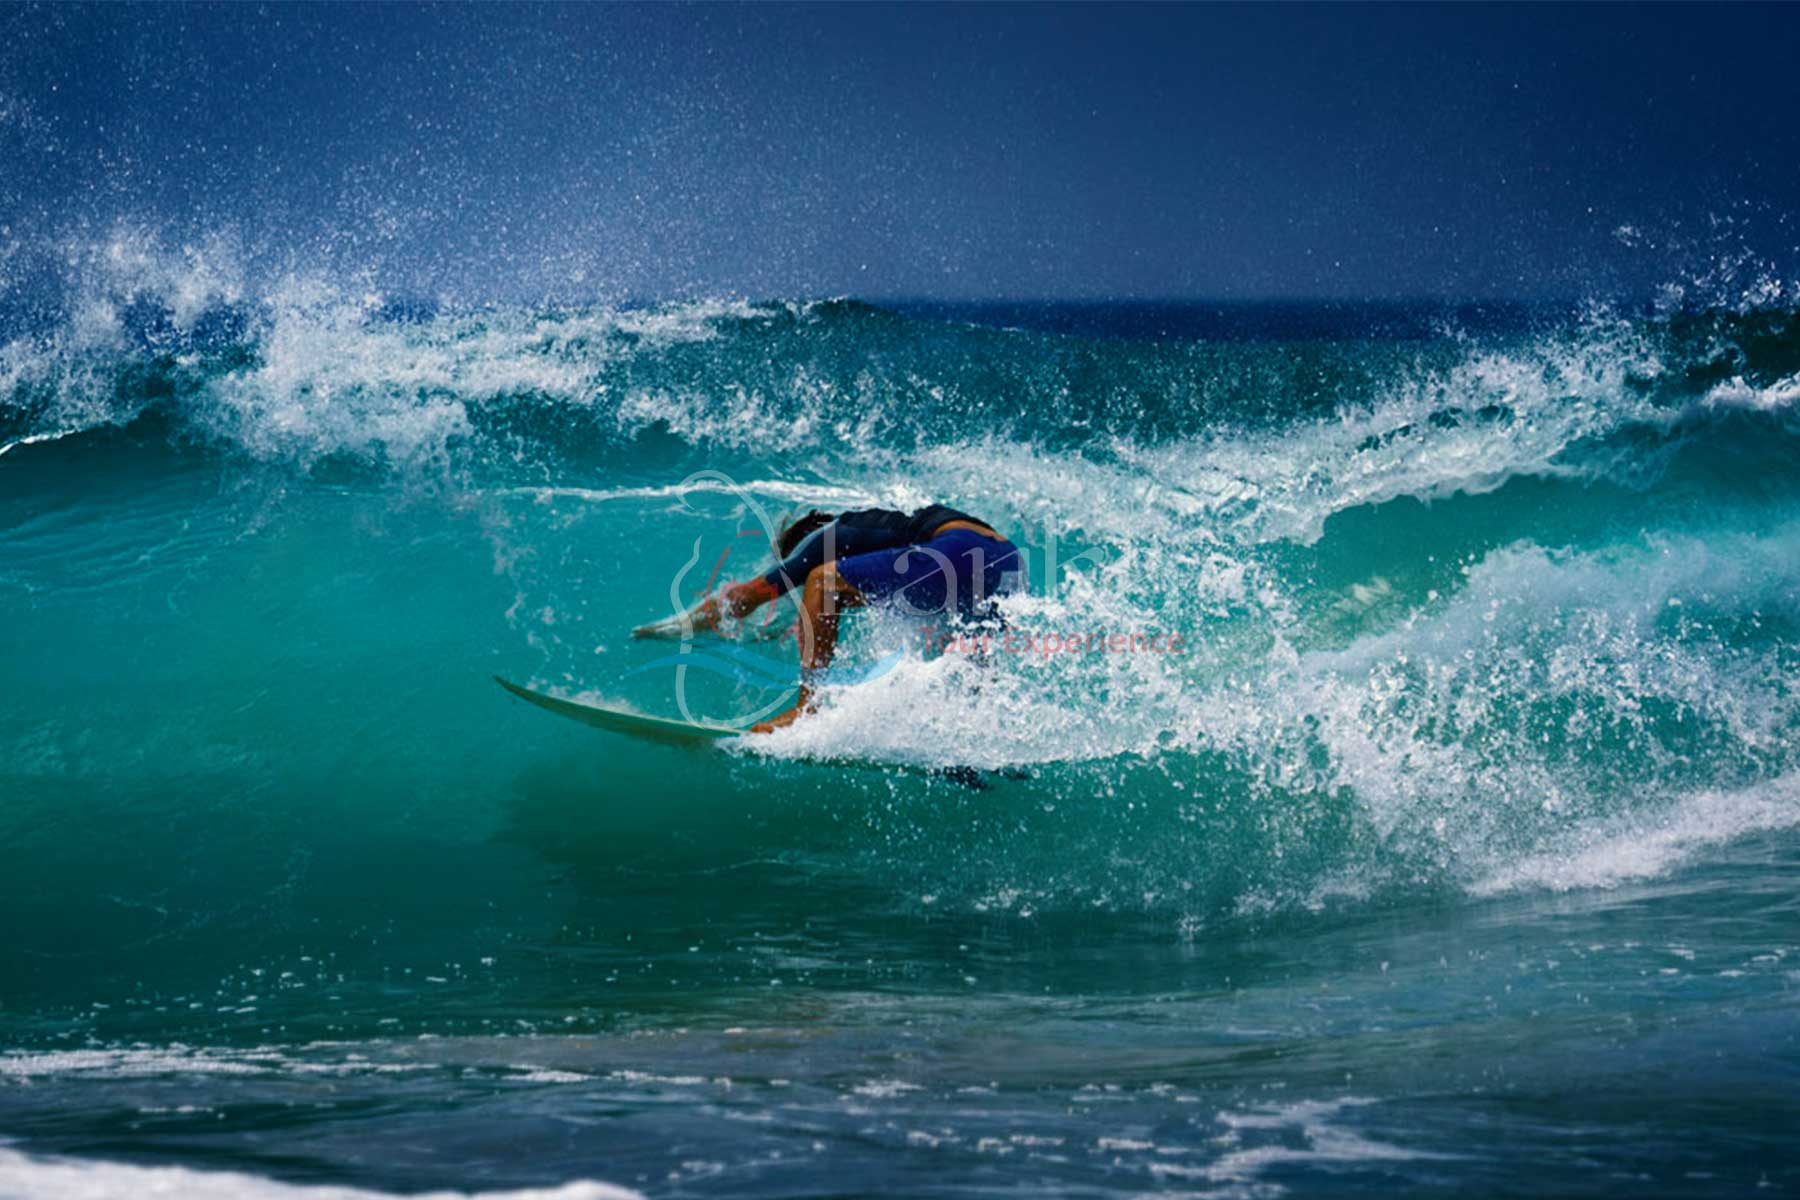 Best things to do in Sri Lanka, Surfing in Sri Lanka